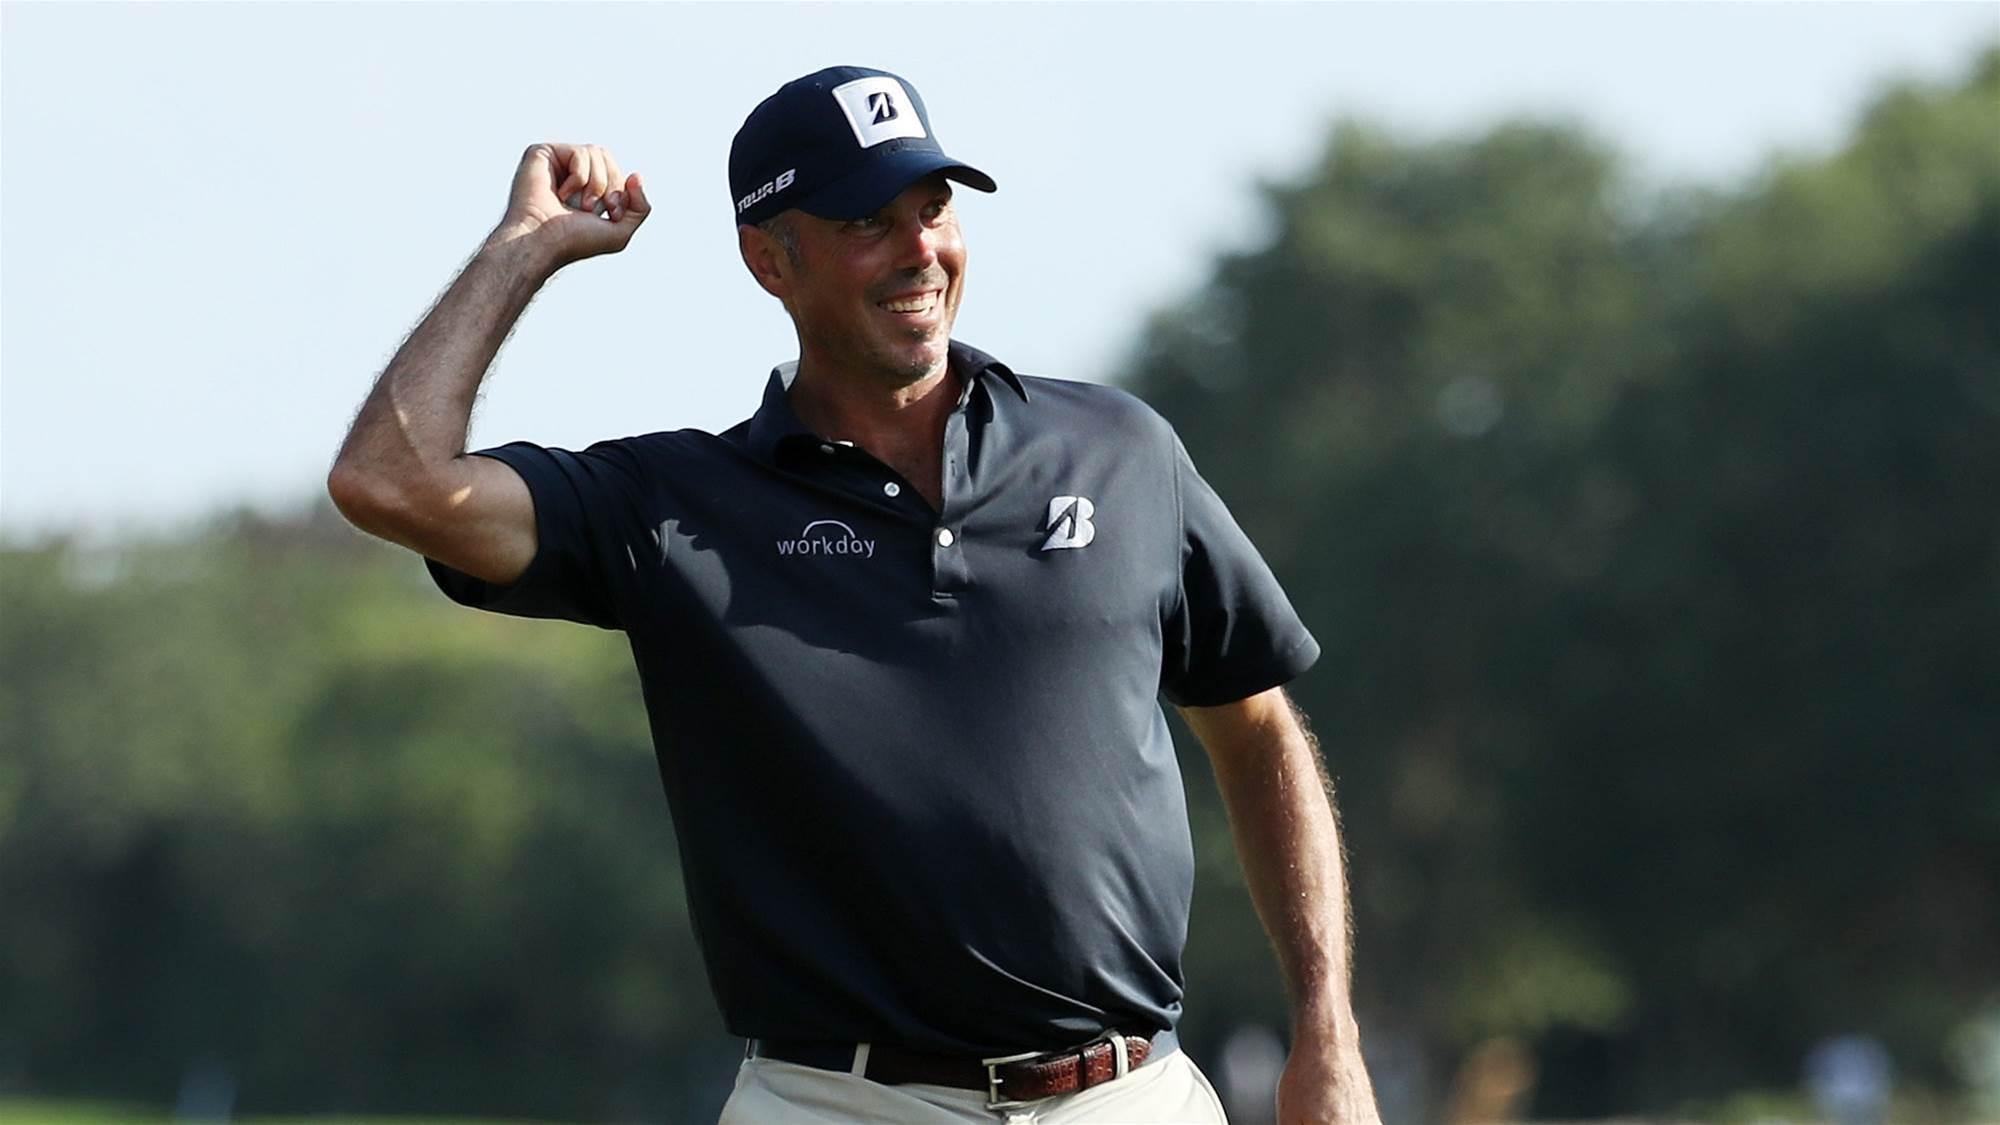 PGA Tour: Kuchar ends four-year winless drought